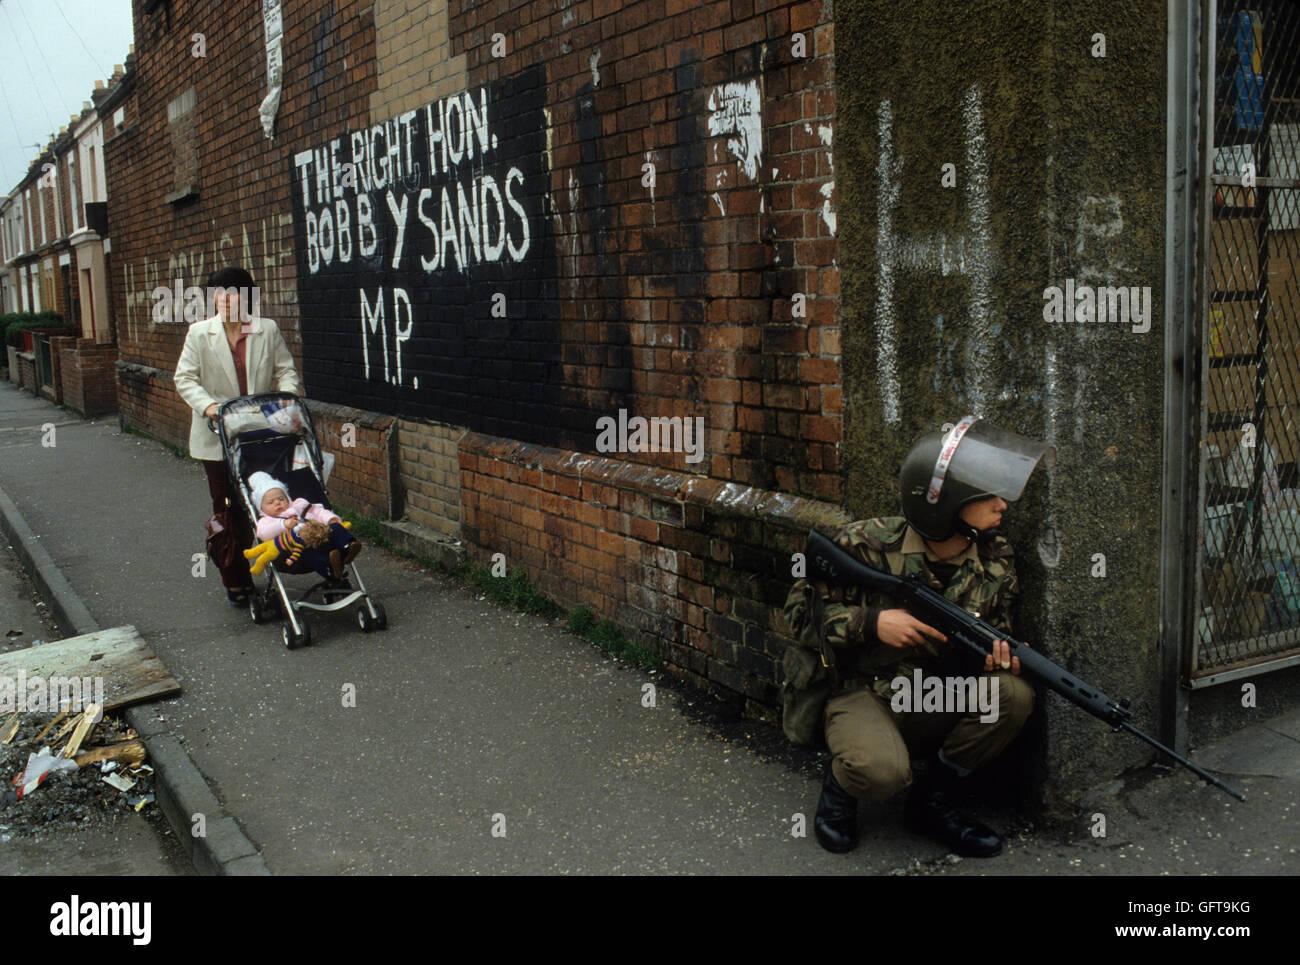 Los disturbios de Belfast Irlanda del Norte de 1980 UK 1981 Homero SYKES Imagen De Stock